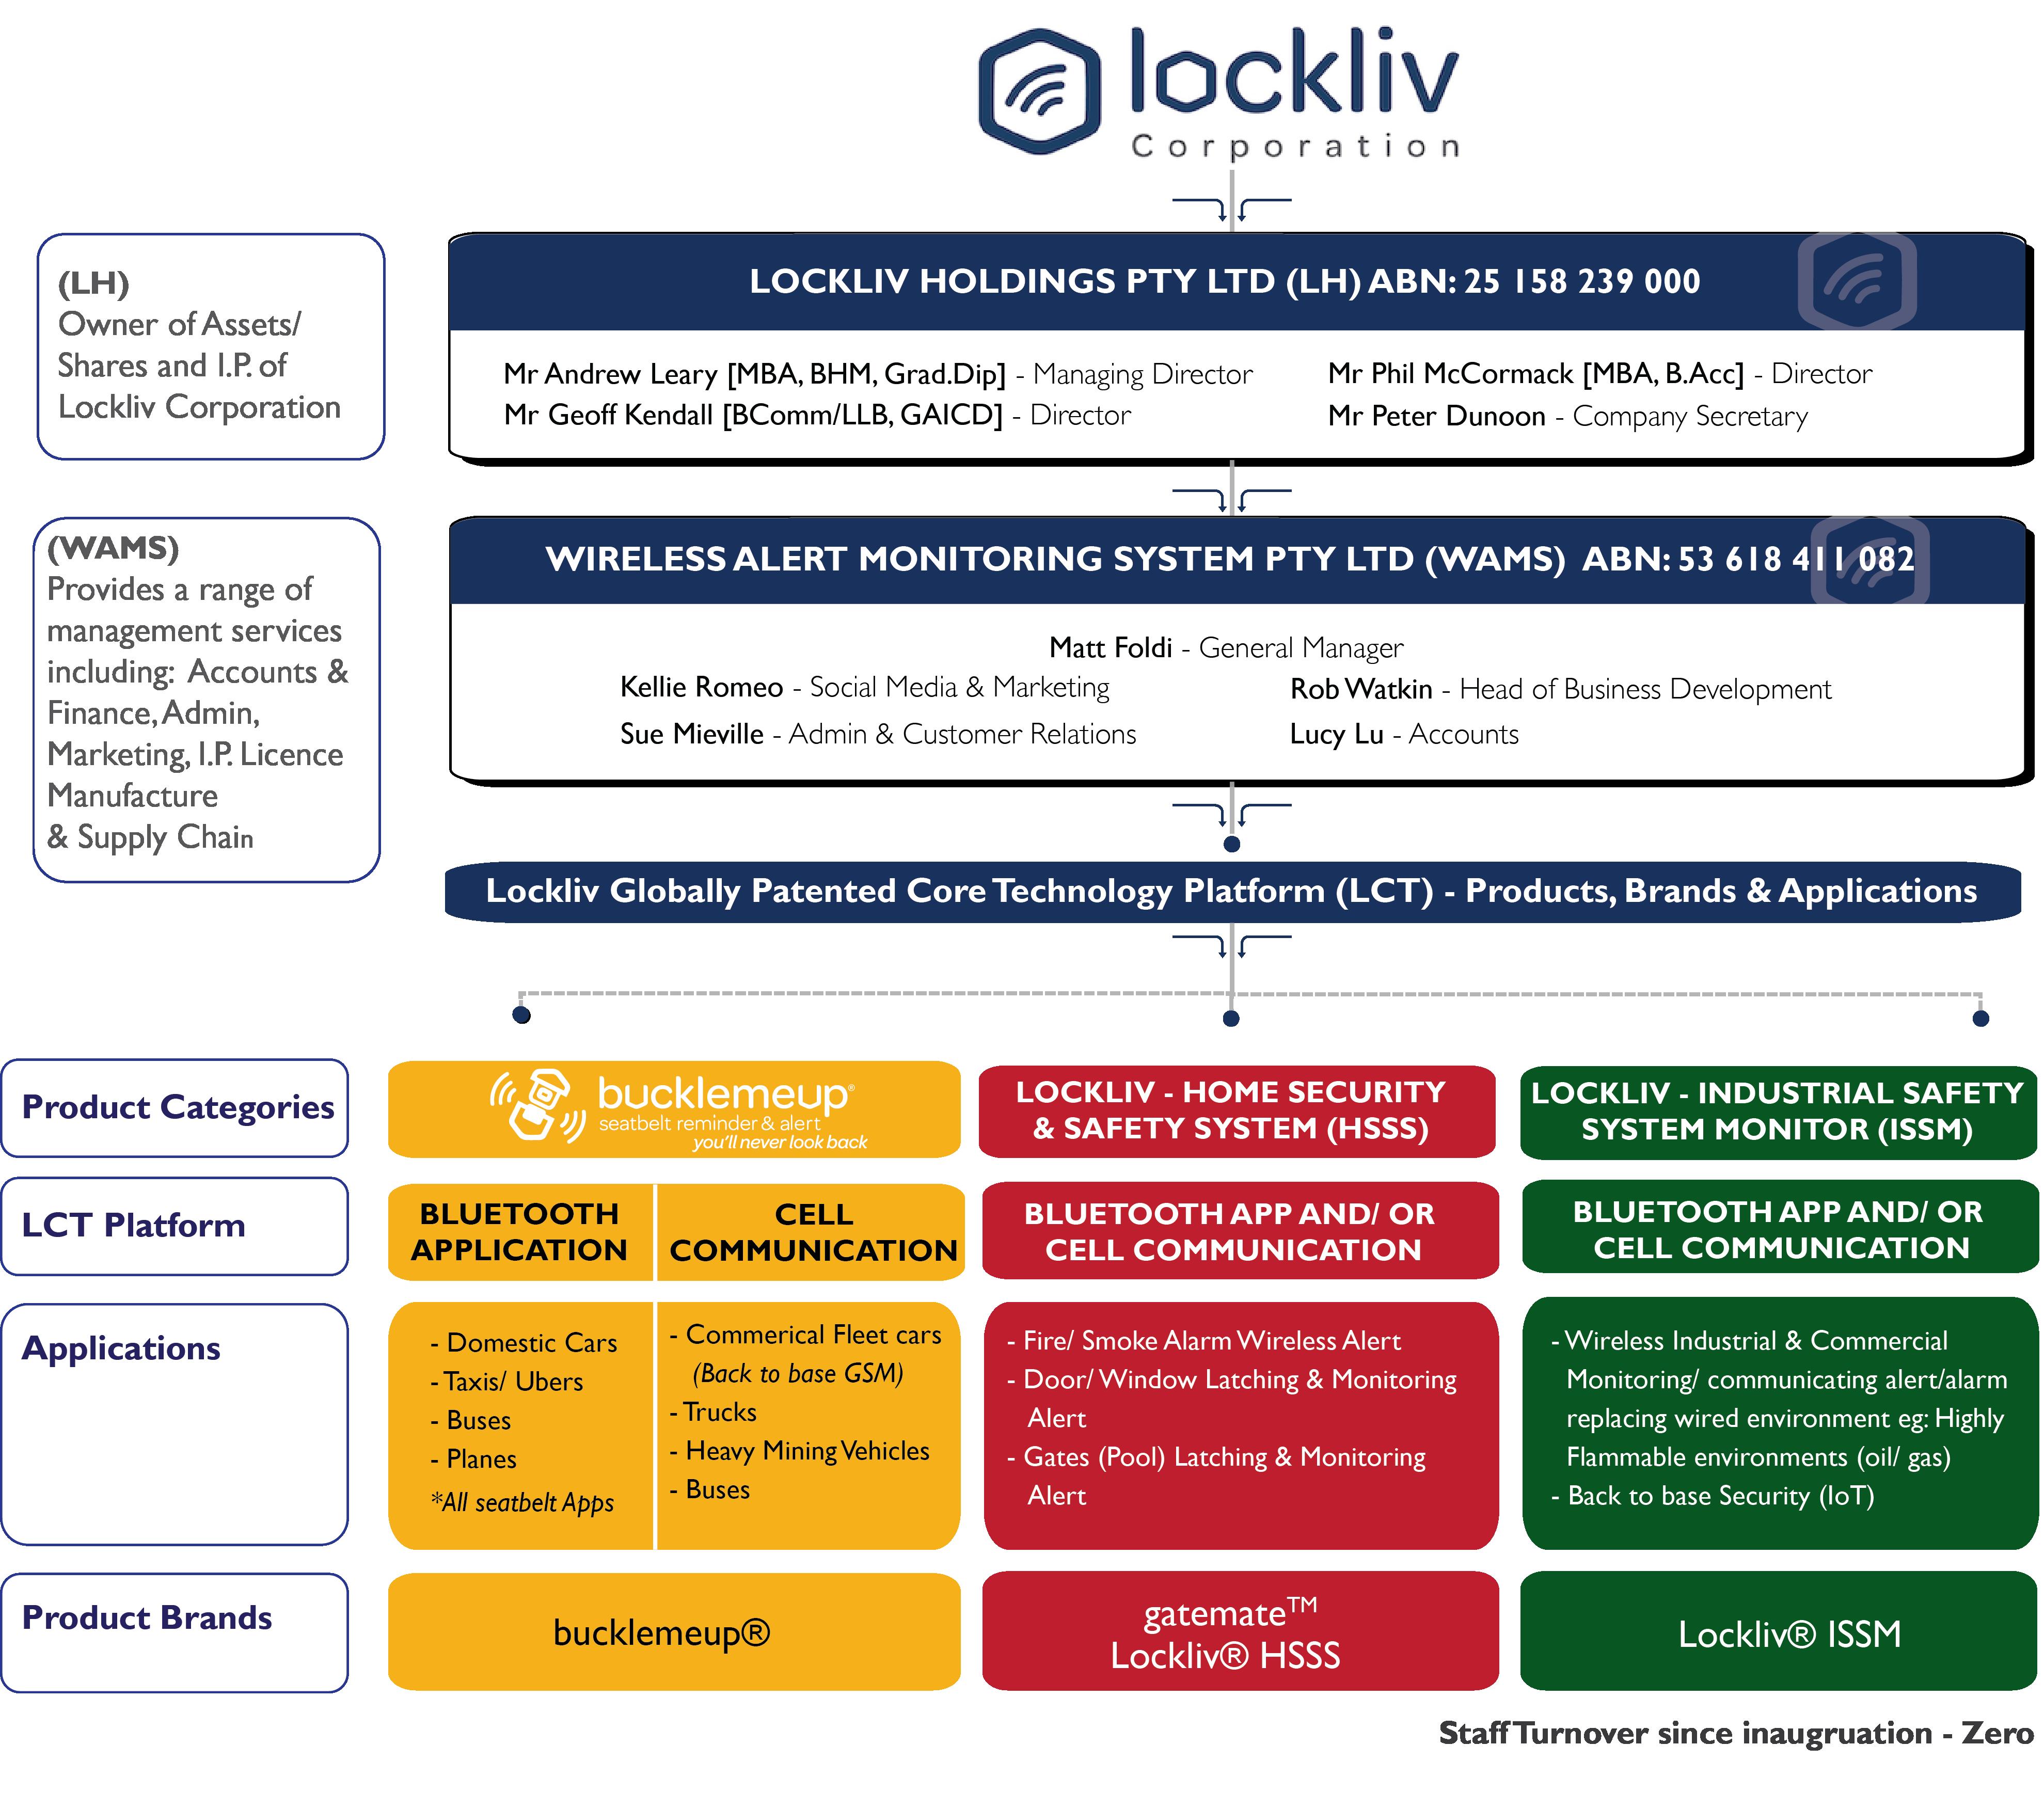 About Us - Lockliv